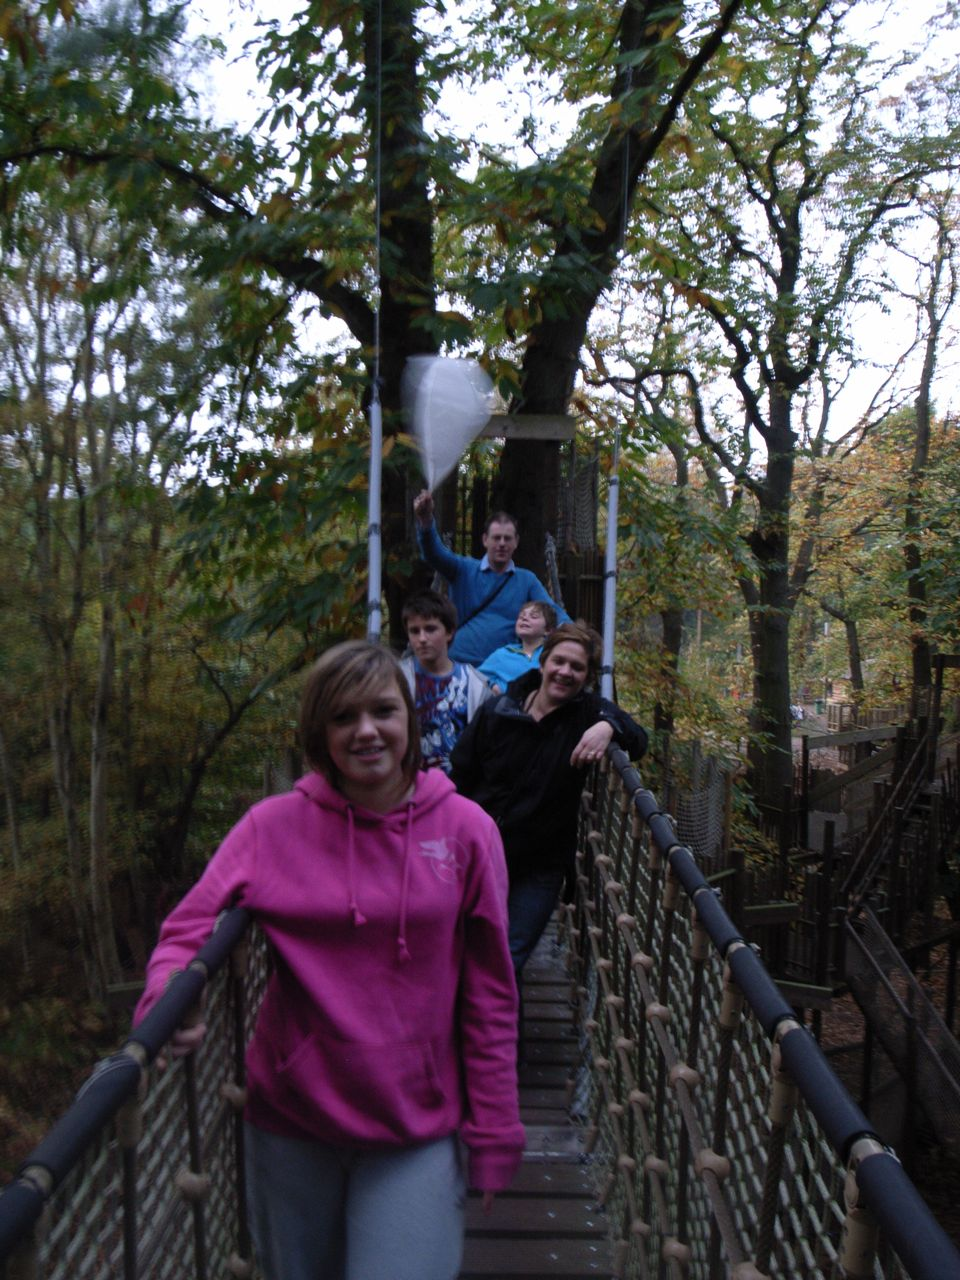 All of us on the broken bridge